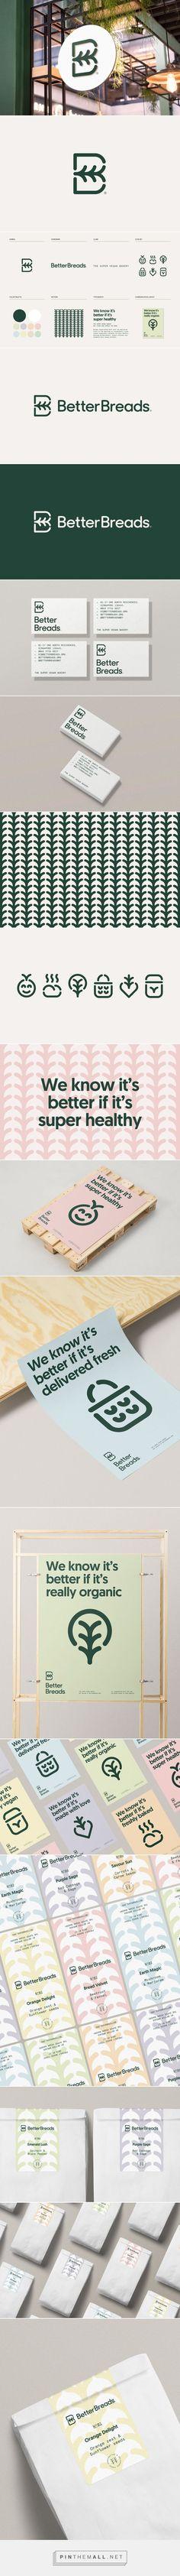 Better Breads logo and branding by Diferente